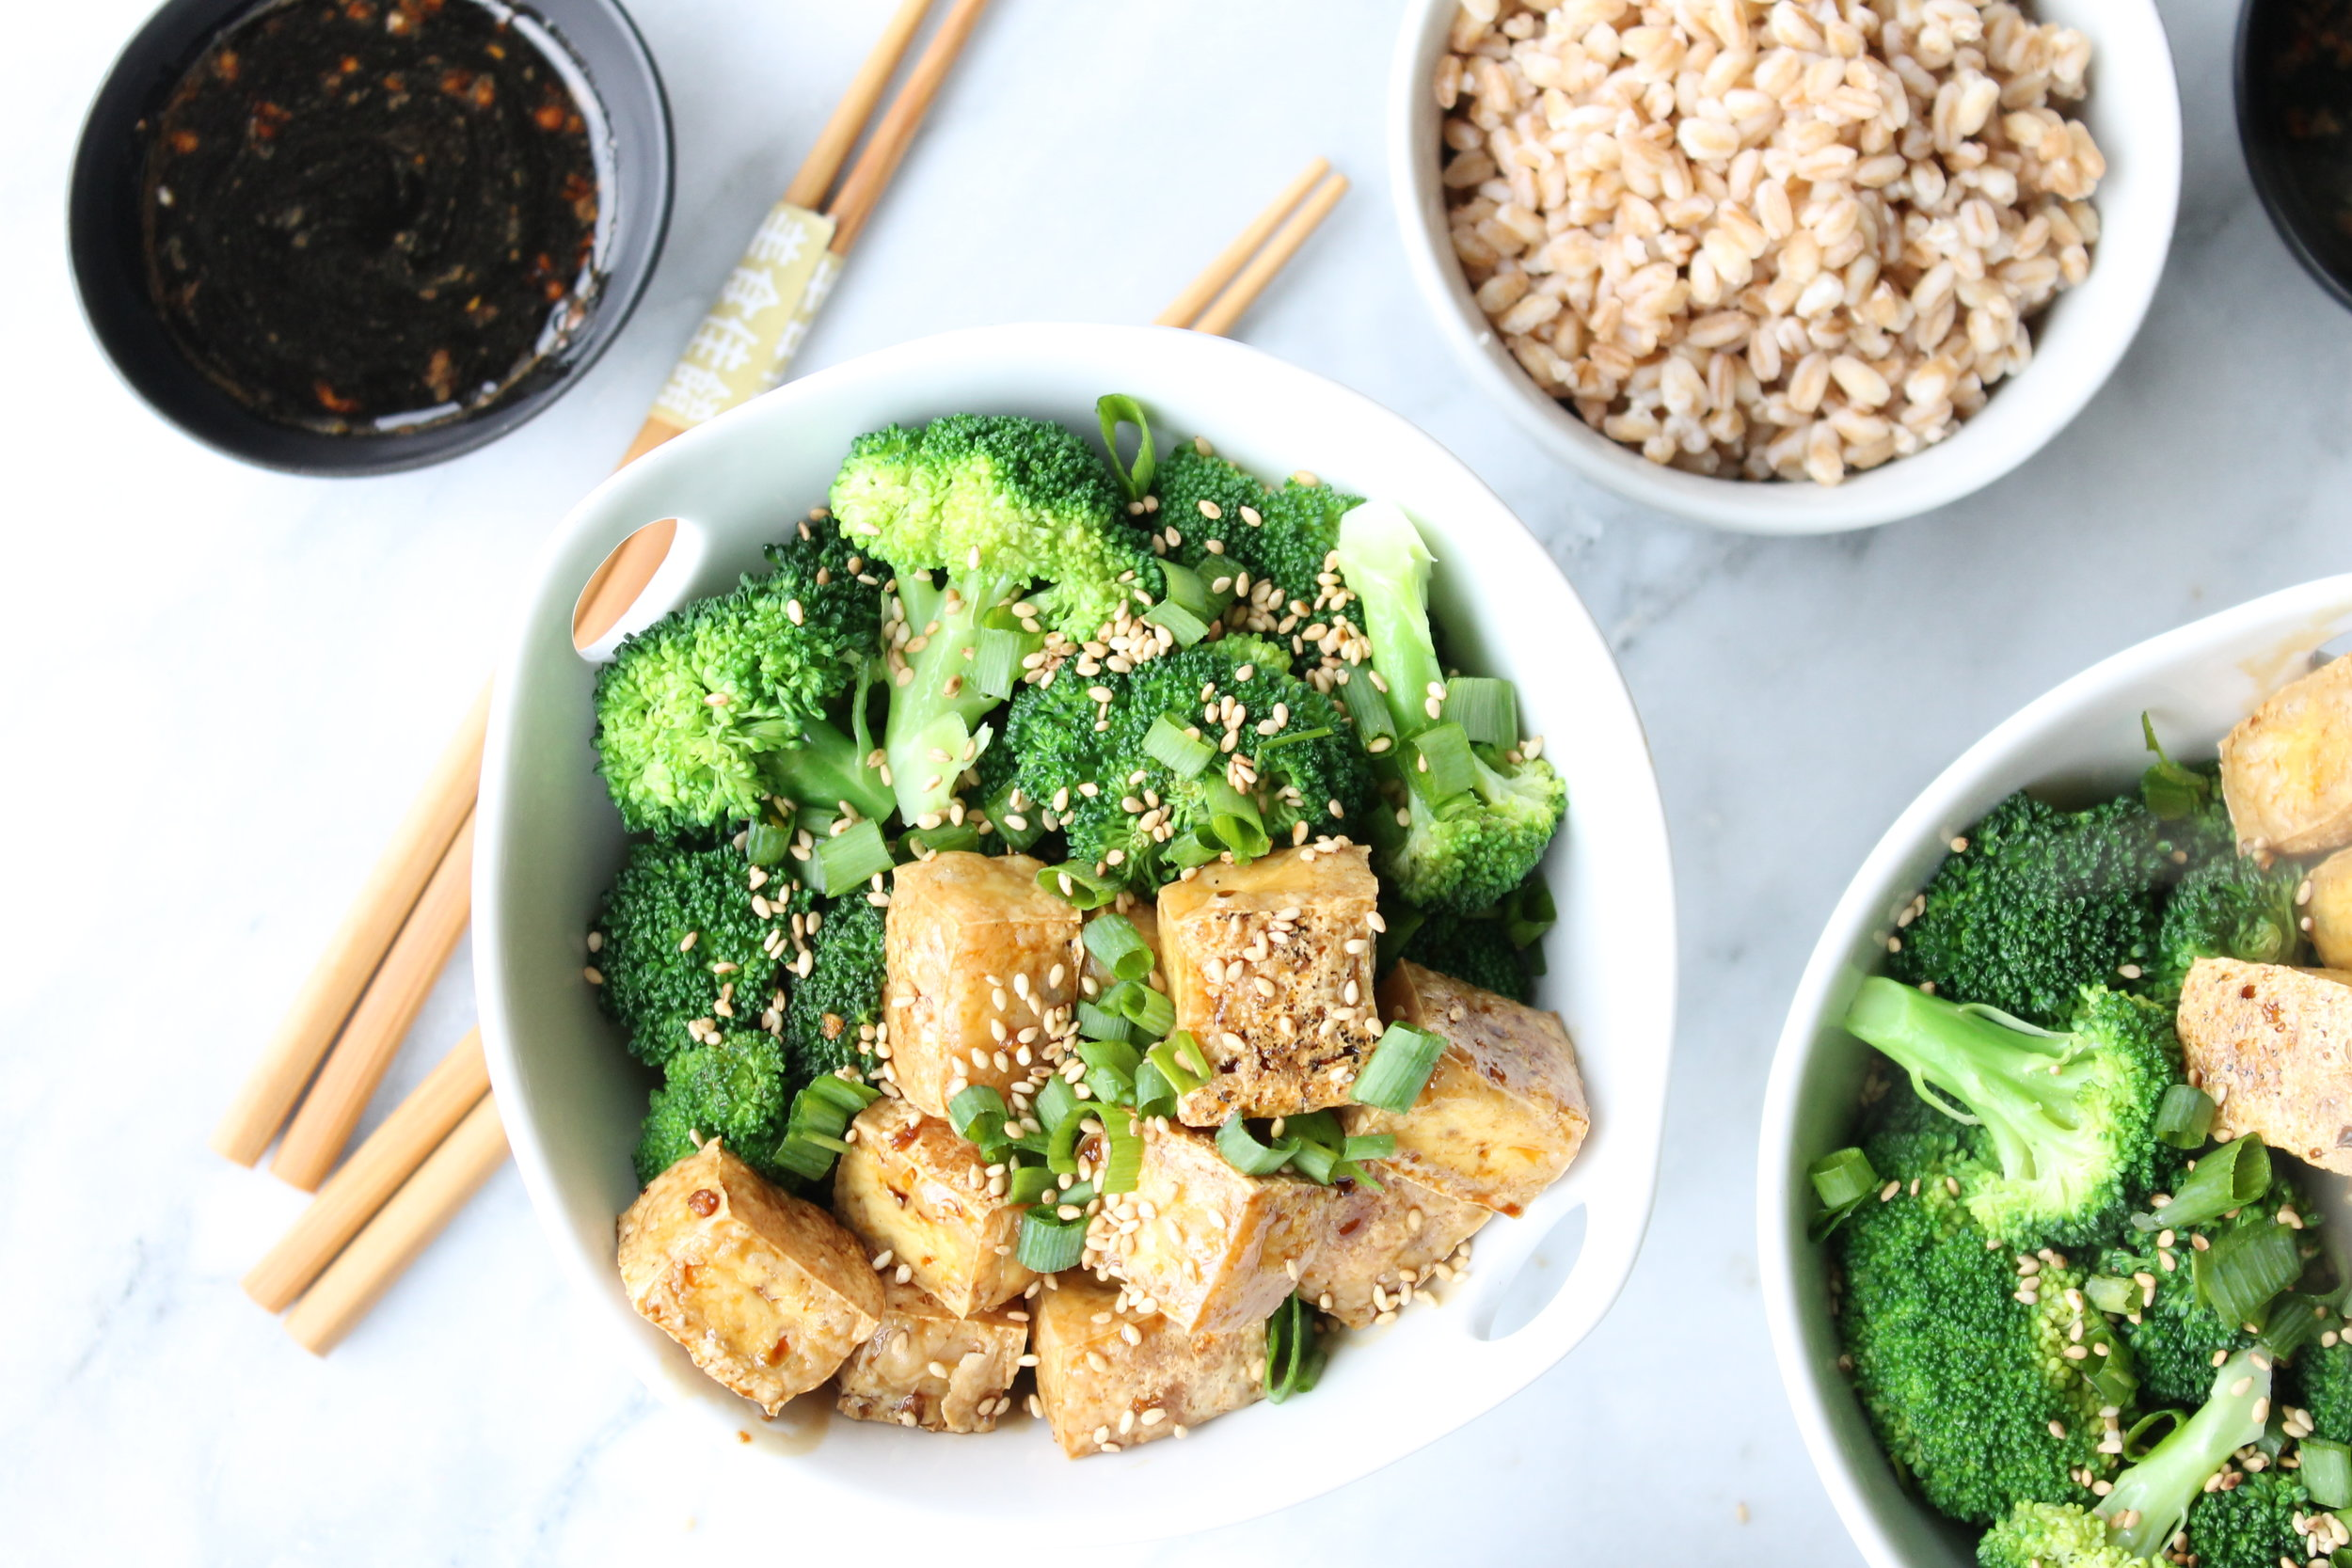 The easiest tofu and broccoli sesame bowl by Alavita Prenatal Nutrition